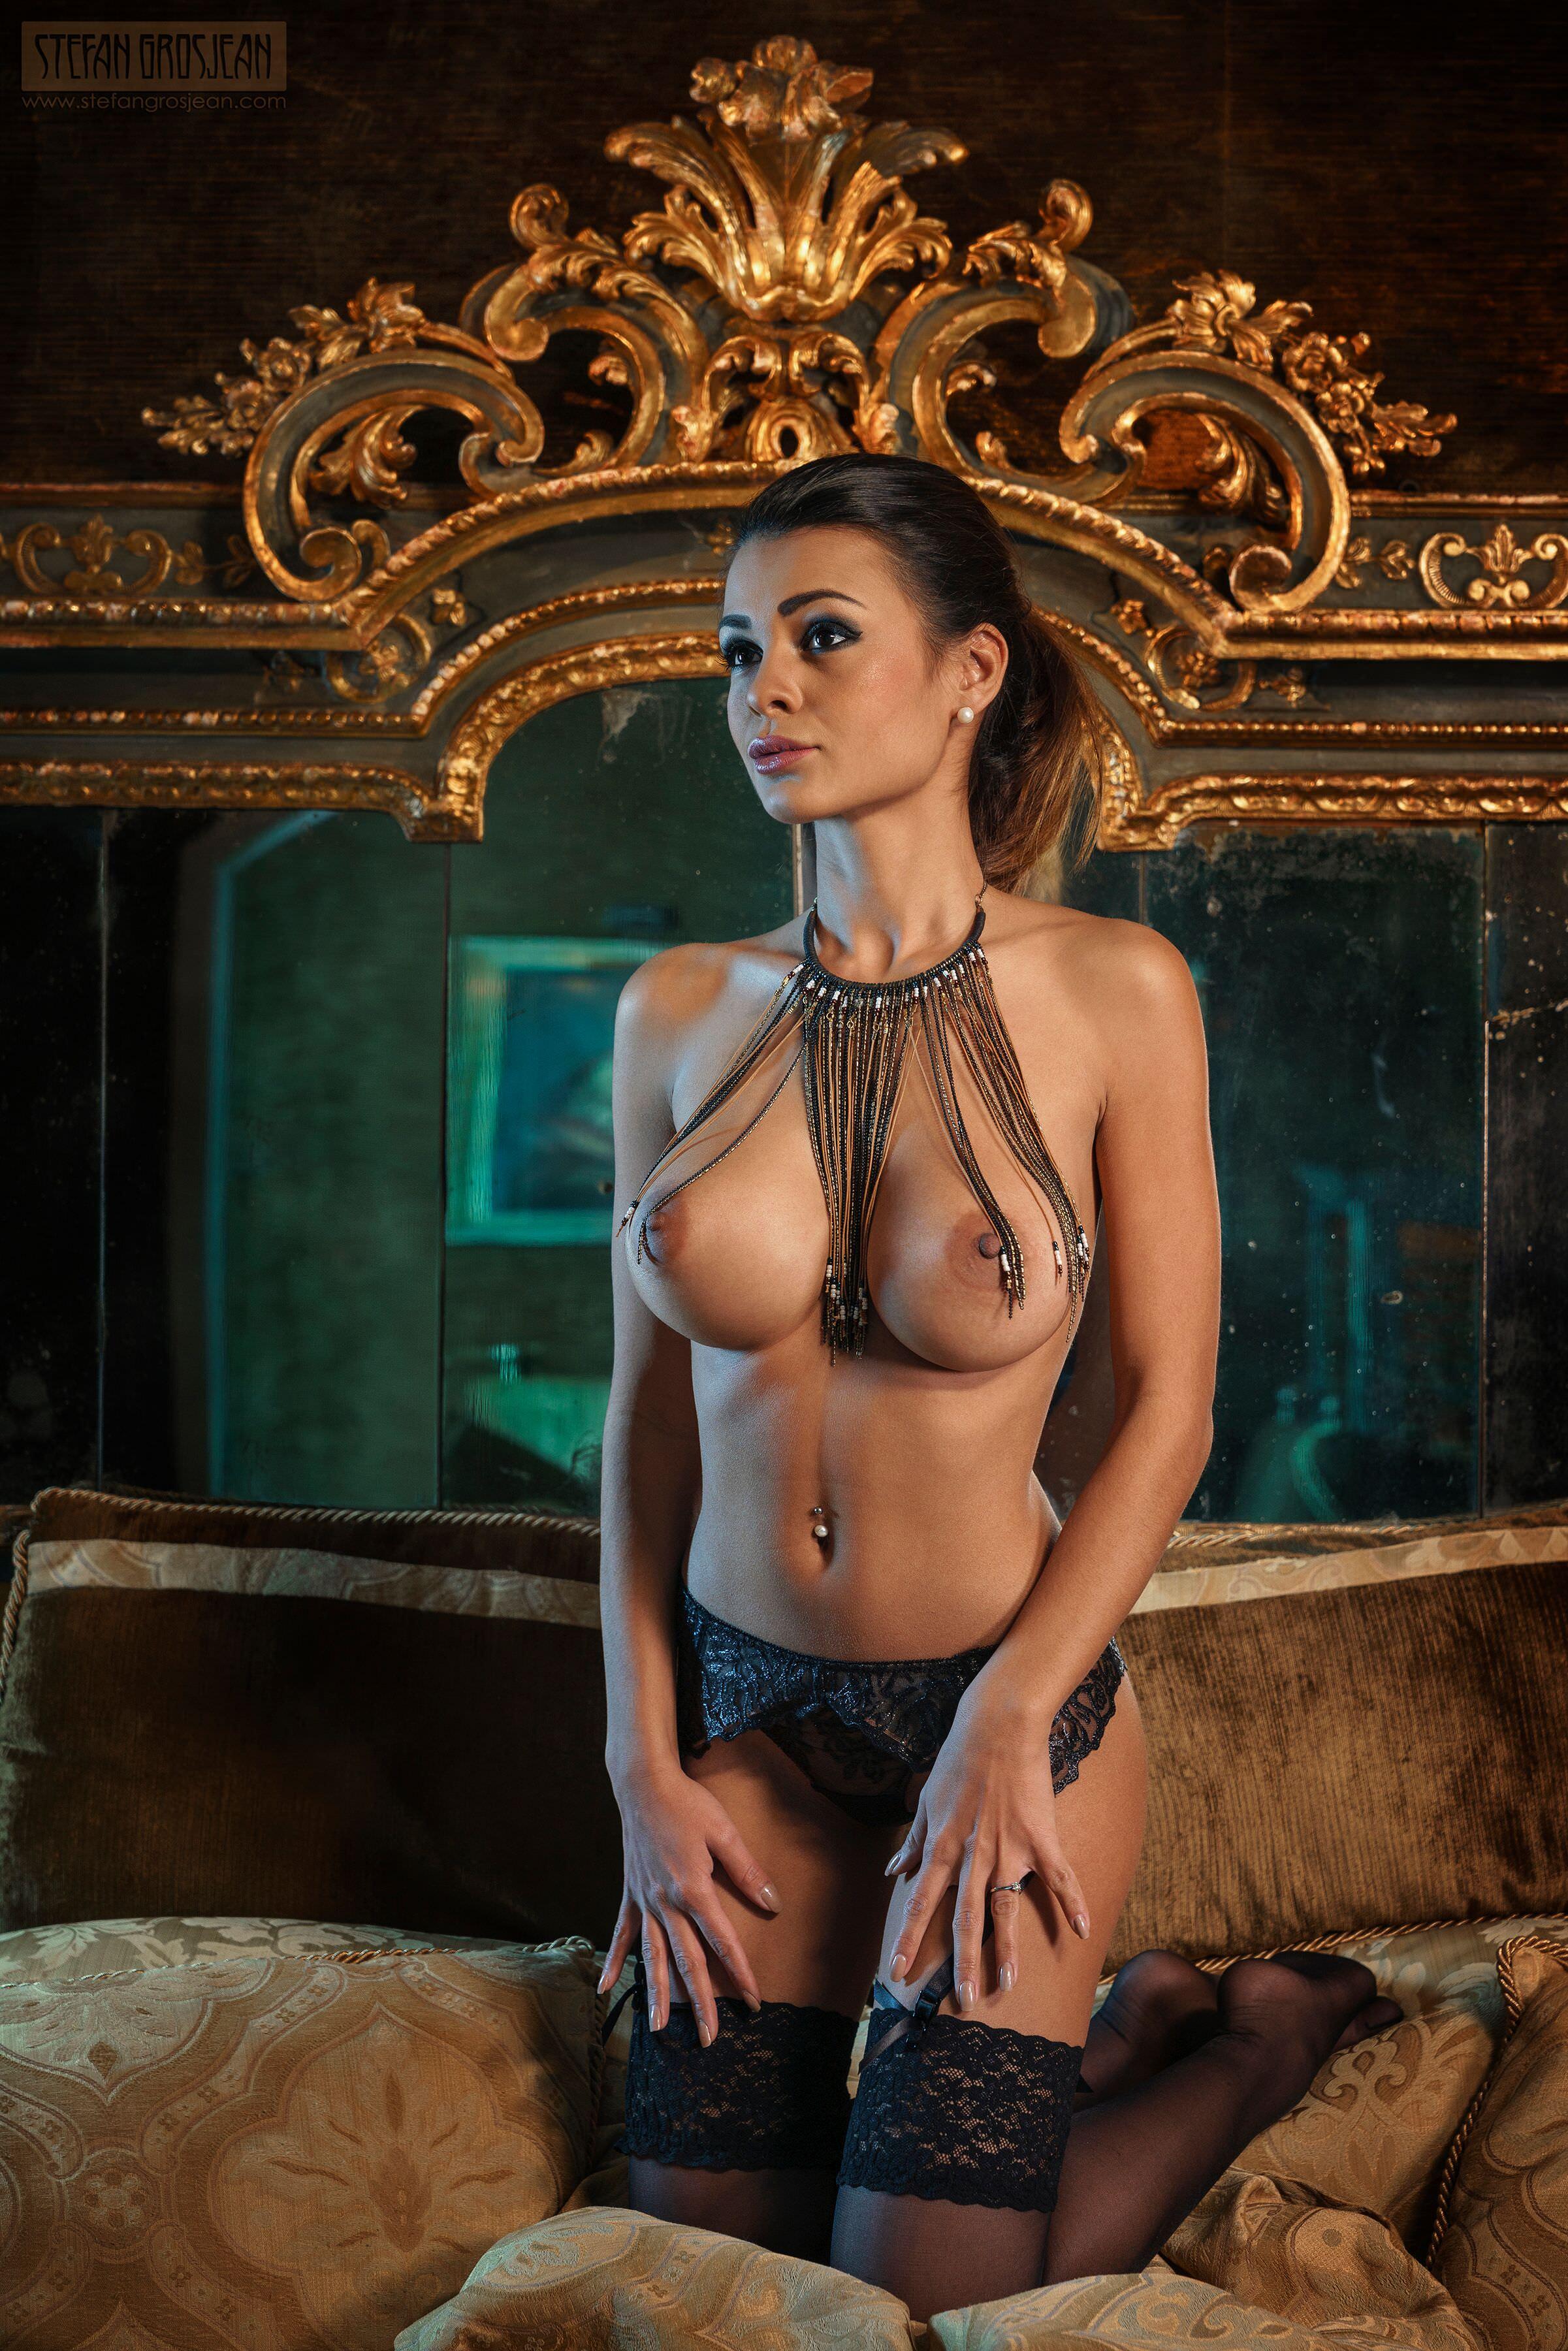 Of porn queen Jenna Jameson